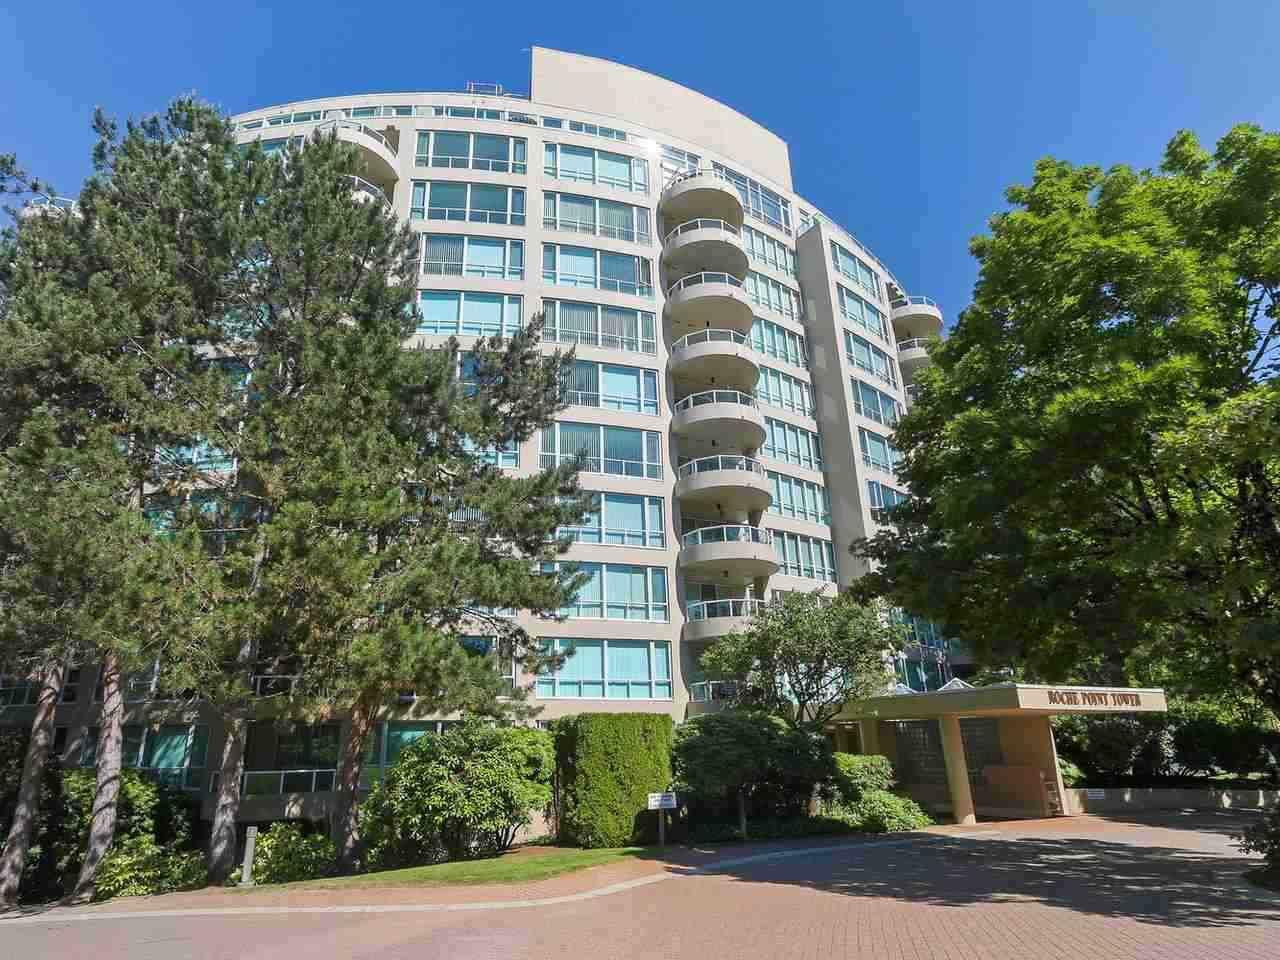 Main Photo: 406 995 ROCHE POINT Drive in North Vancouver: Roche Point Condo for sale : MLS®# R2427144